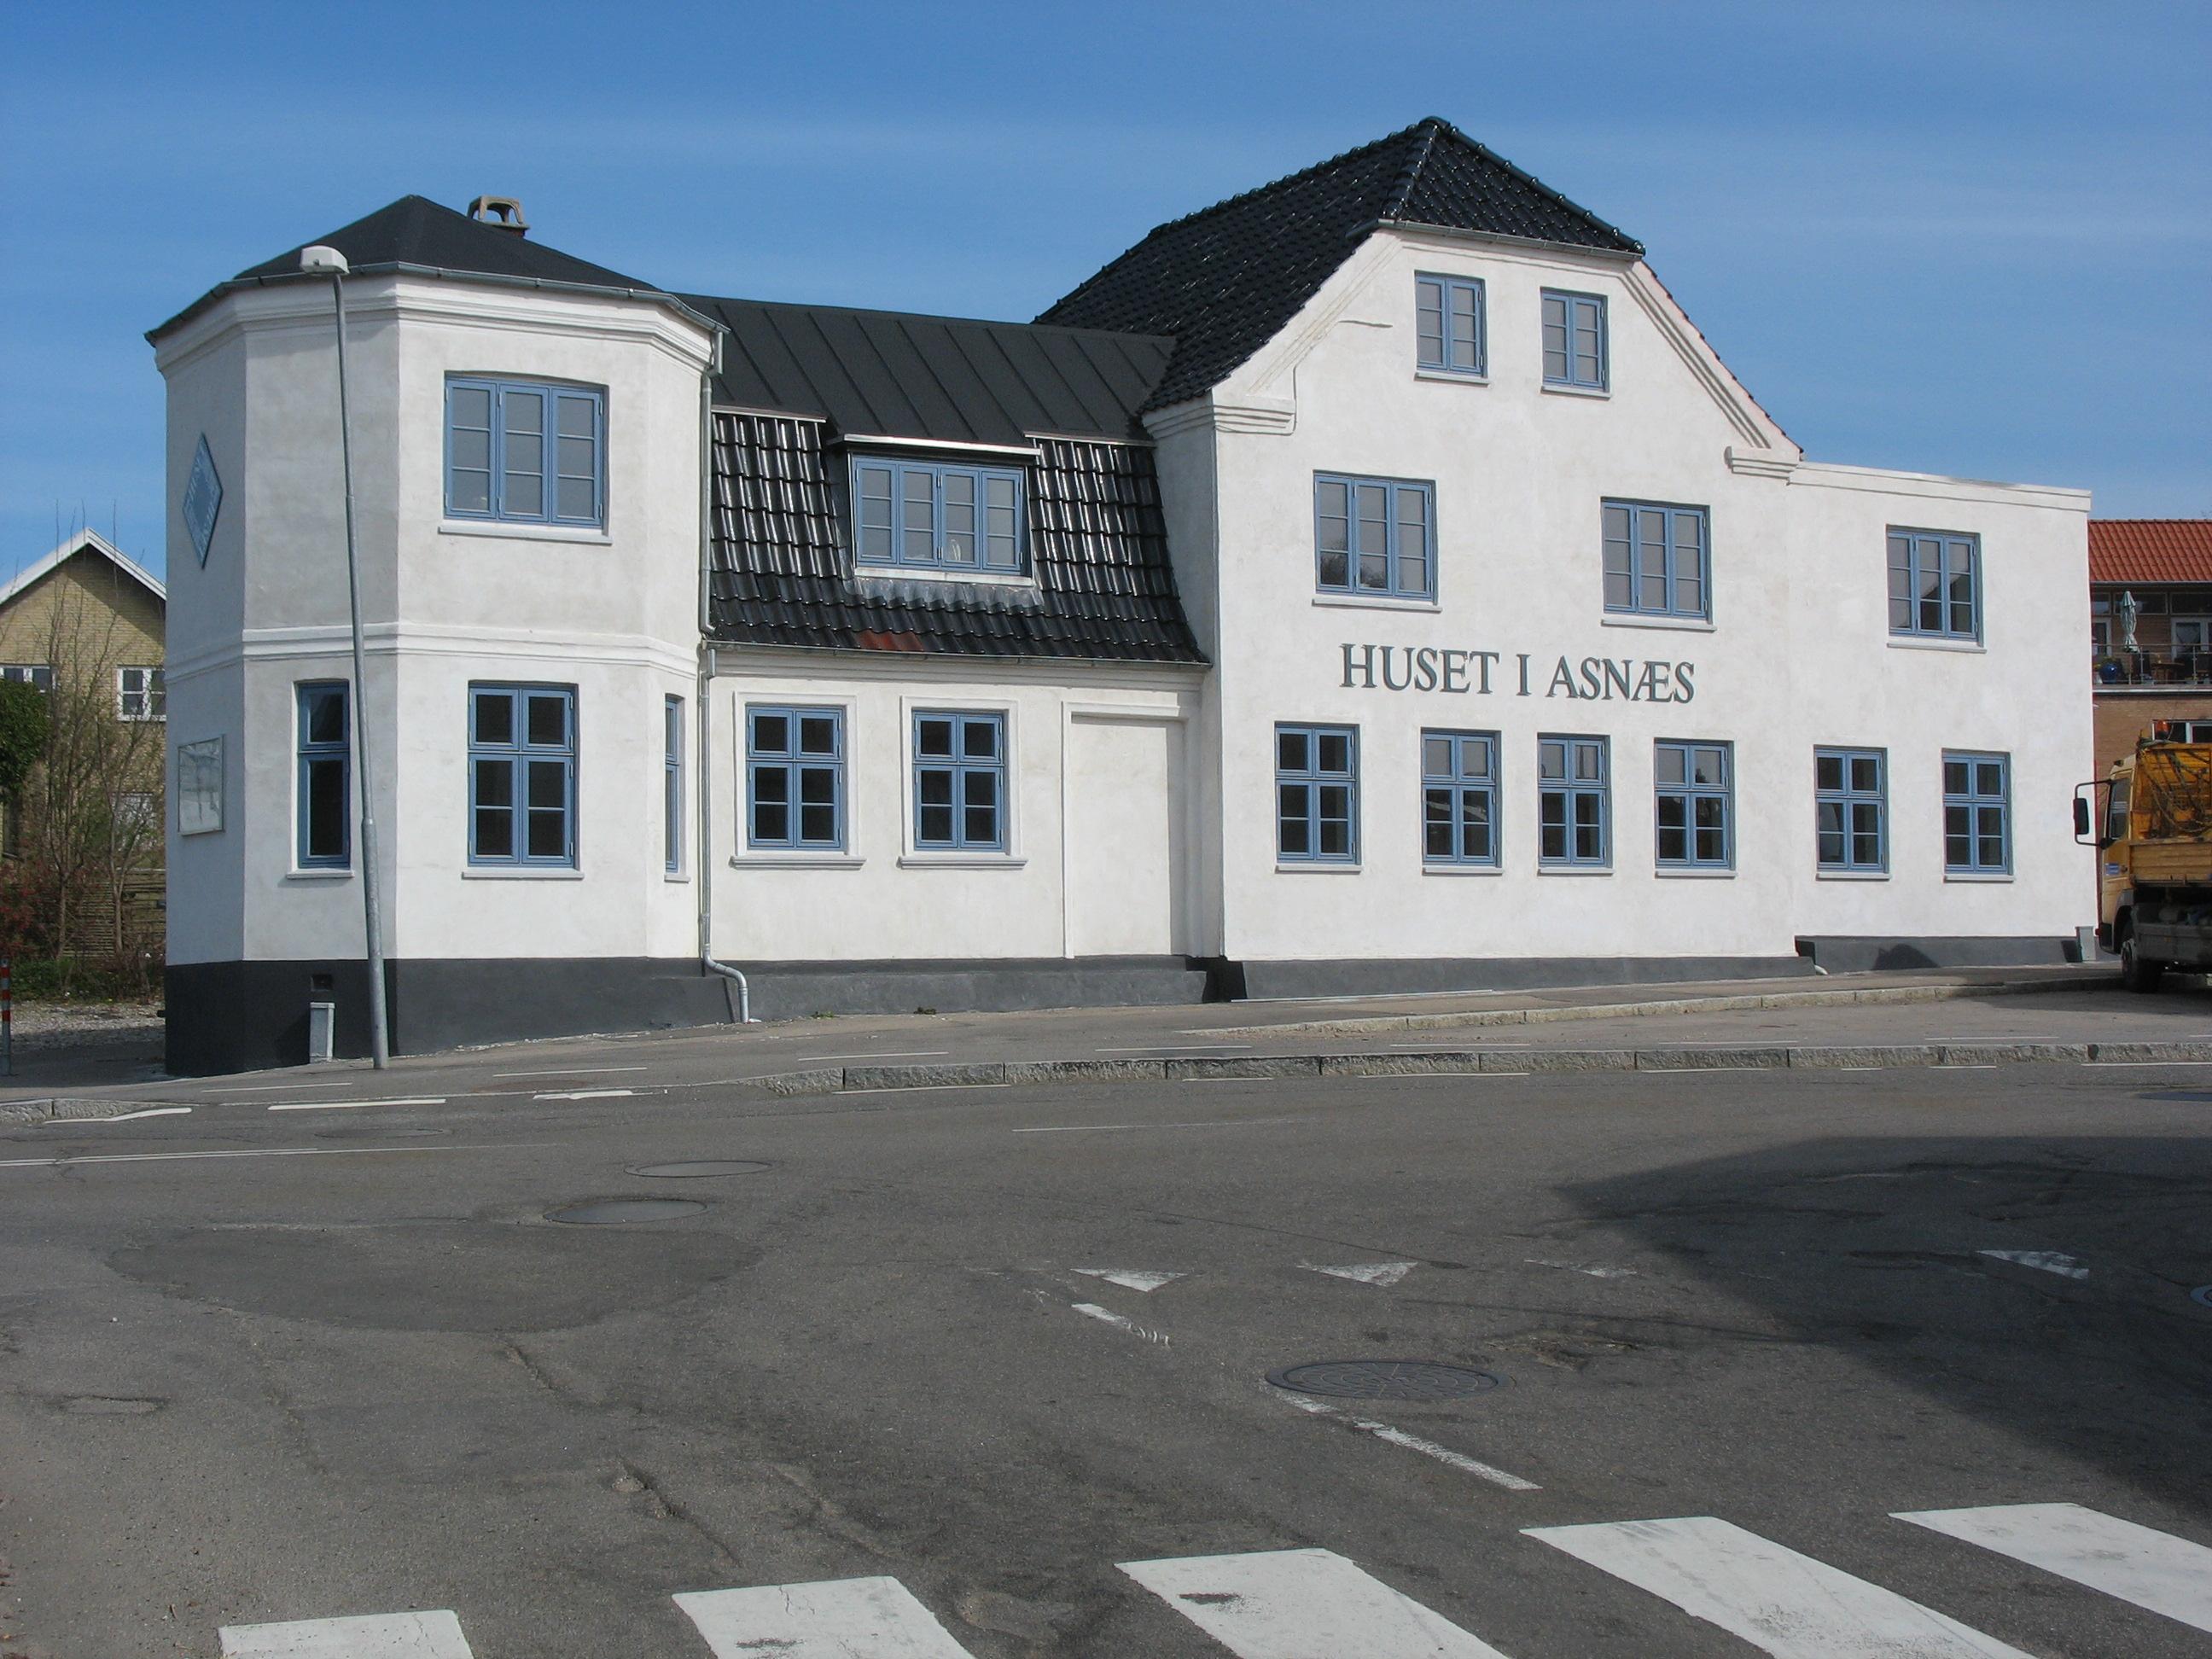 Dateihuset I Asnæs Kulturhusjpg Wikipedia